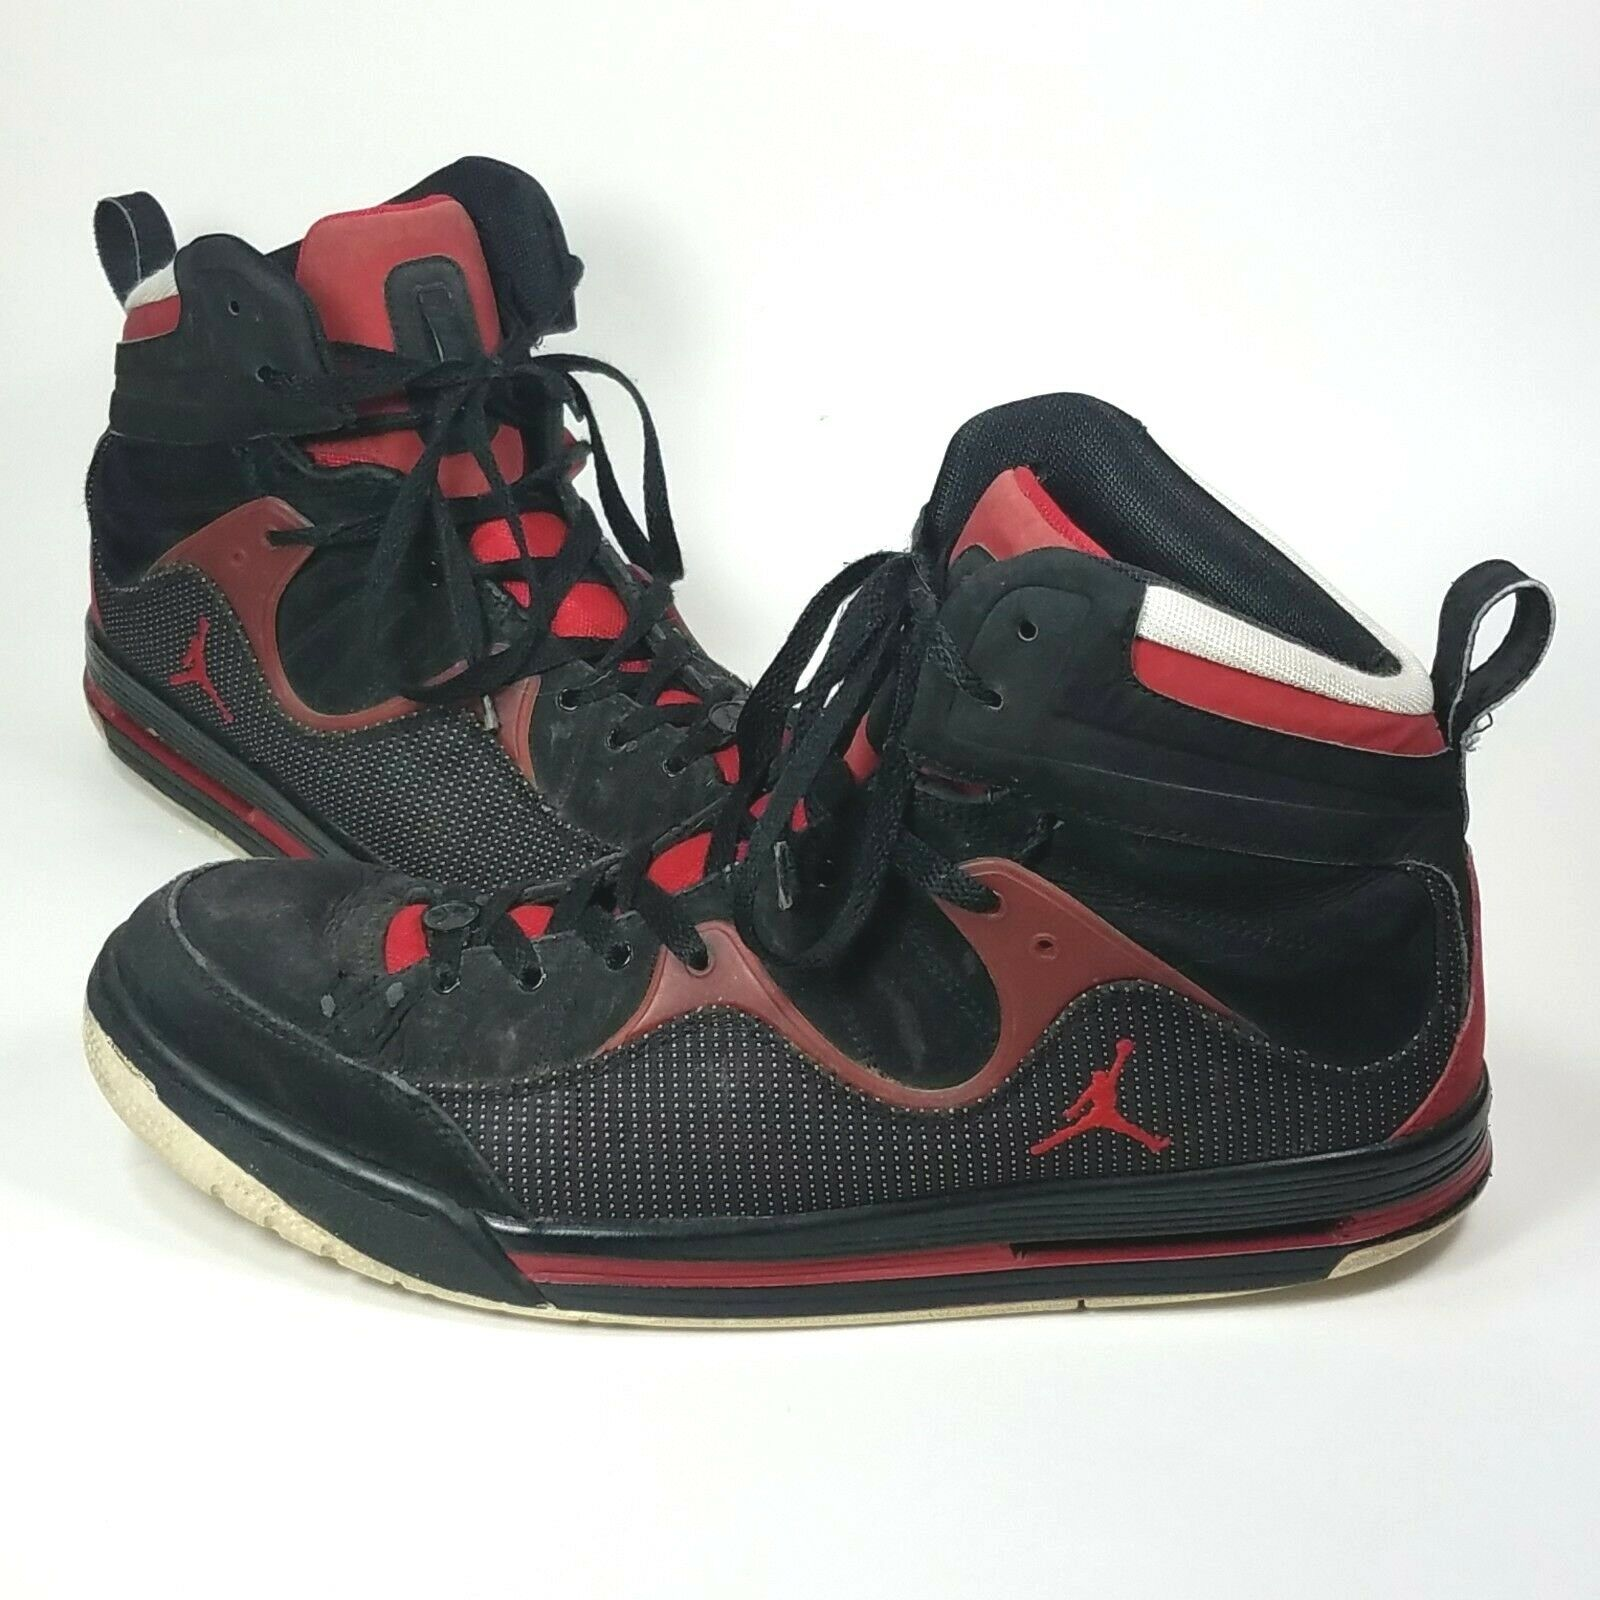 Nike air jordan hoop tr 97 nero, rosso rosso rosso e bianco numero 13 428826-002 varsity | Cliente Al Primo  4a19f3